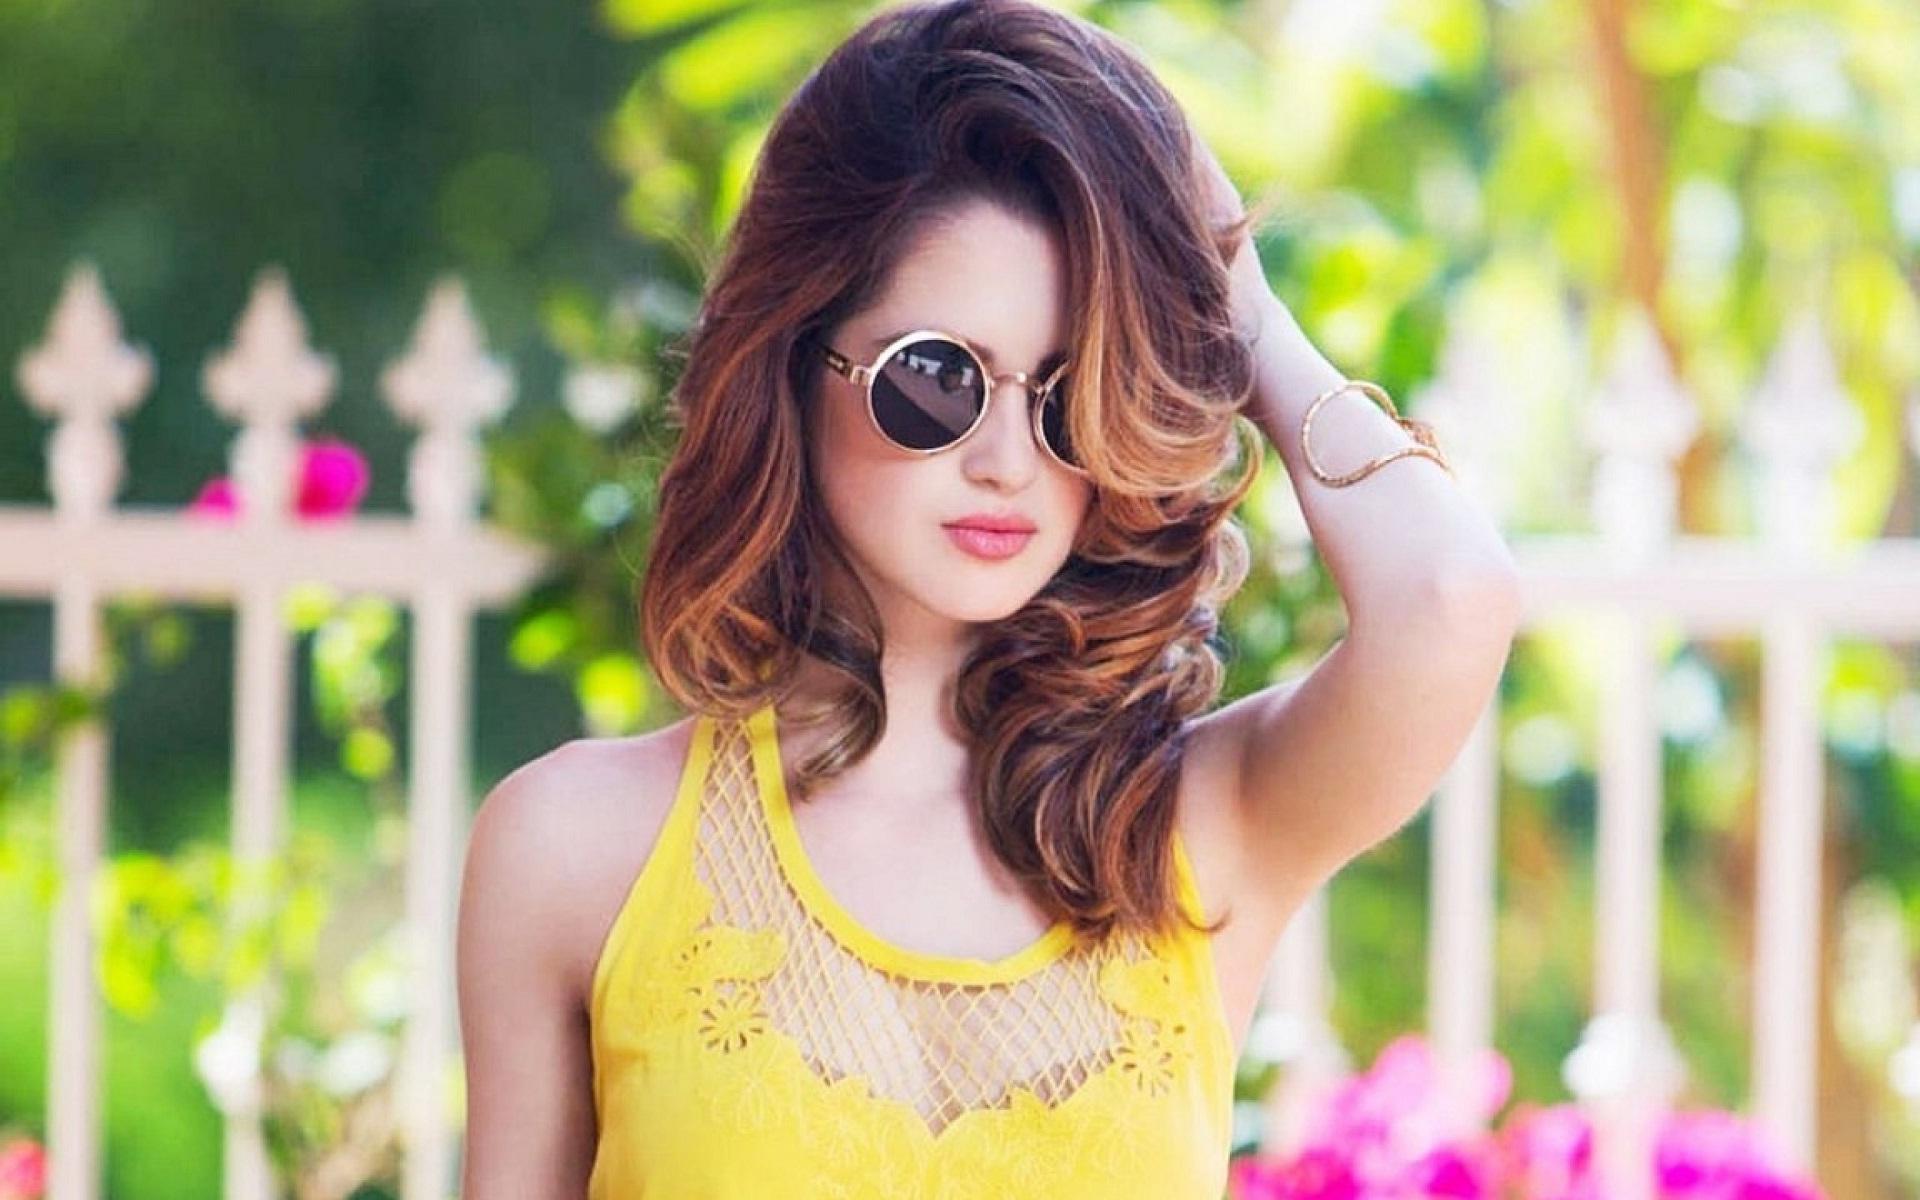 Beautiful stylish girl goggles wear   New hd wallpaperNew 1920x1200